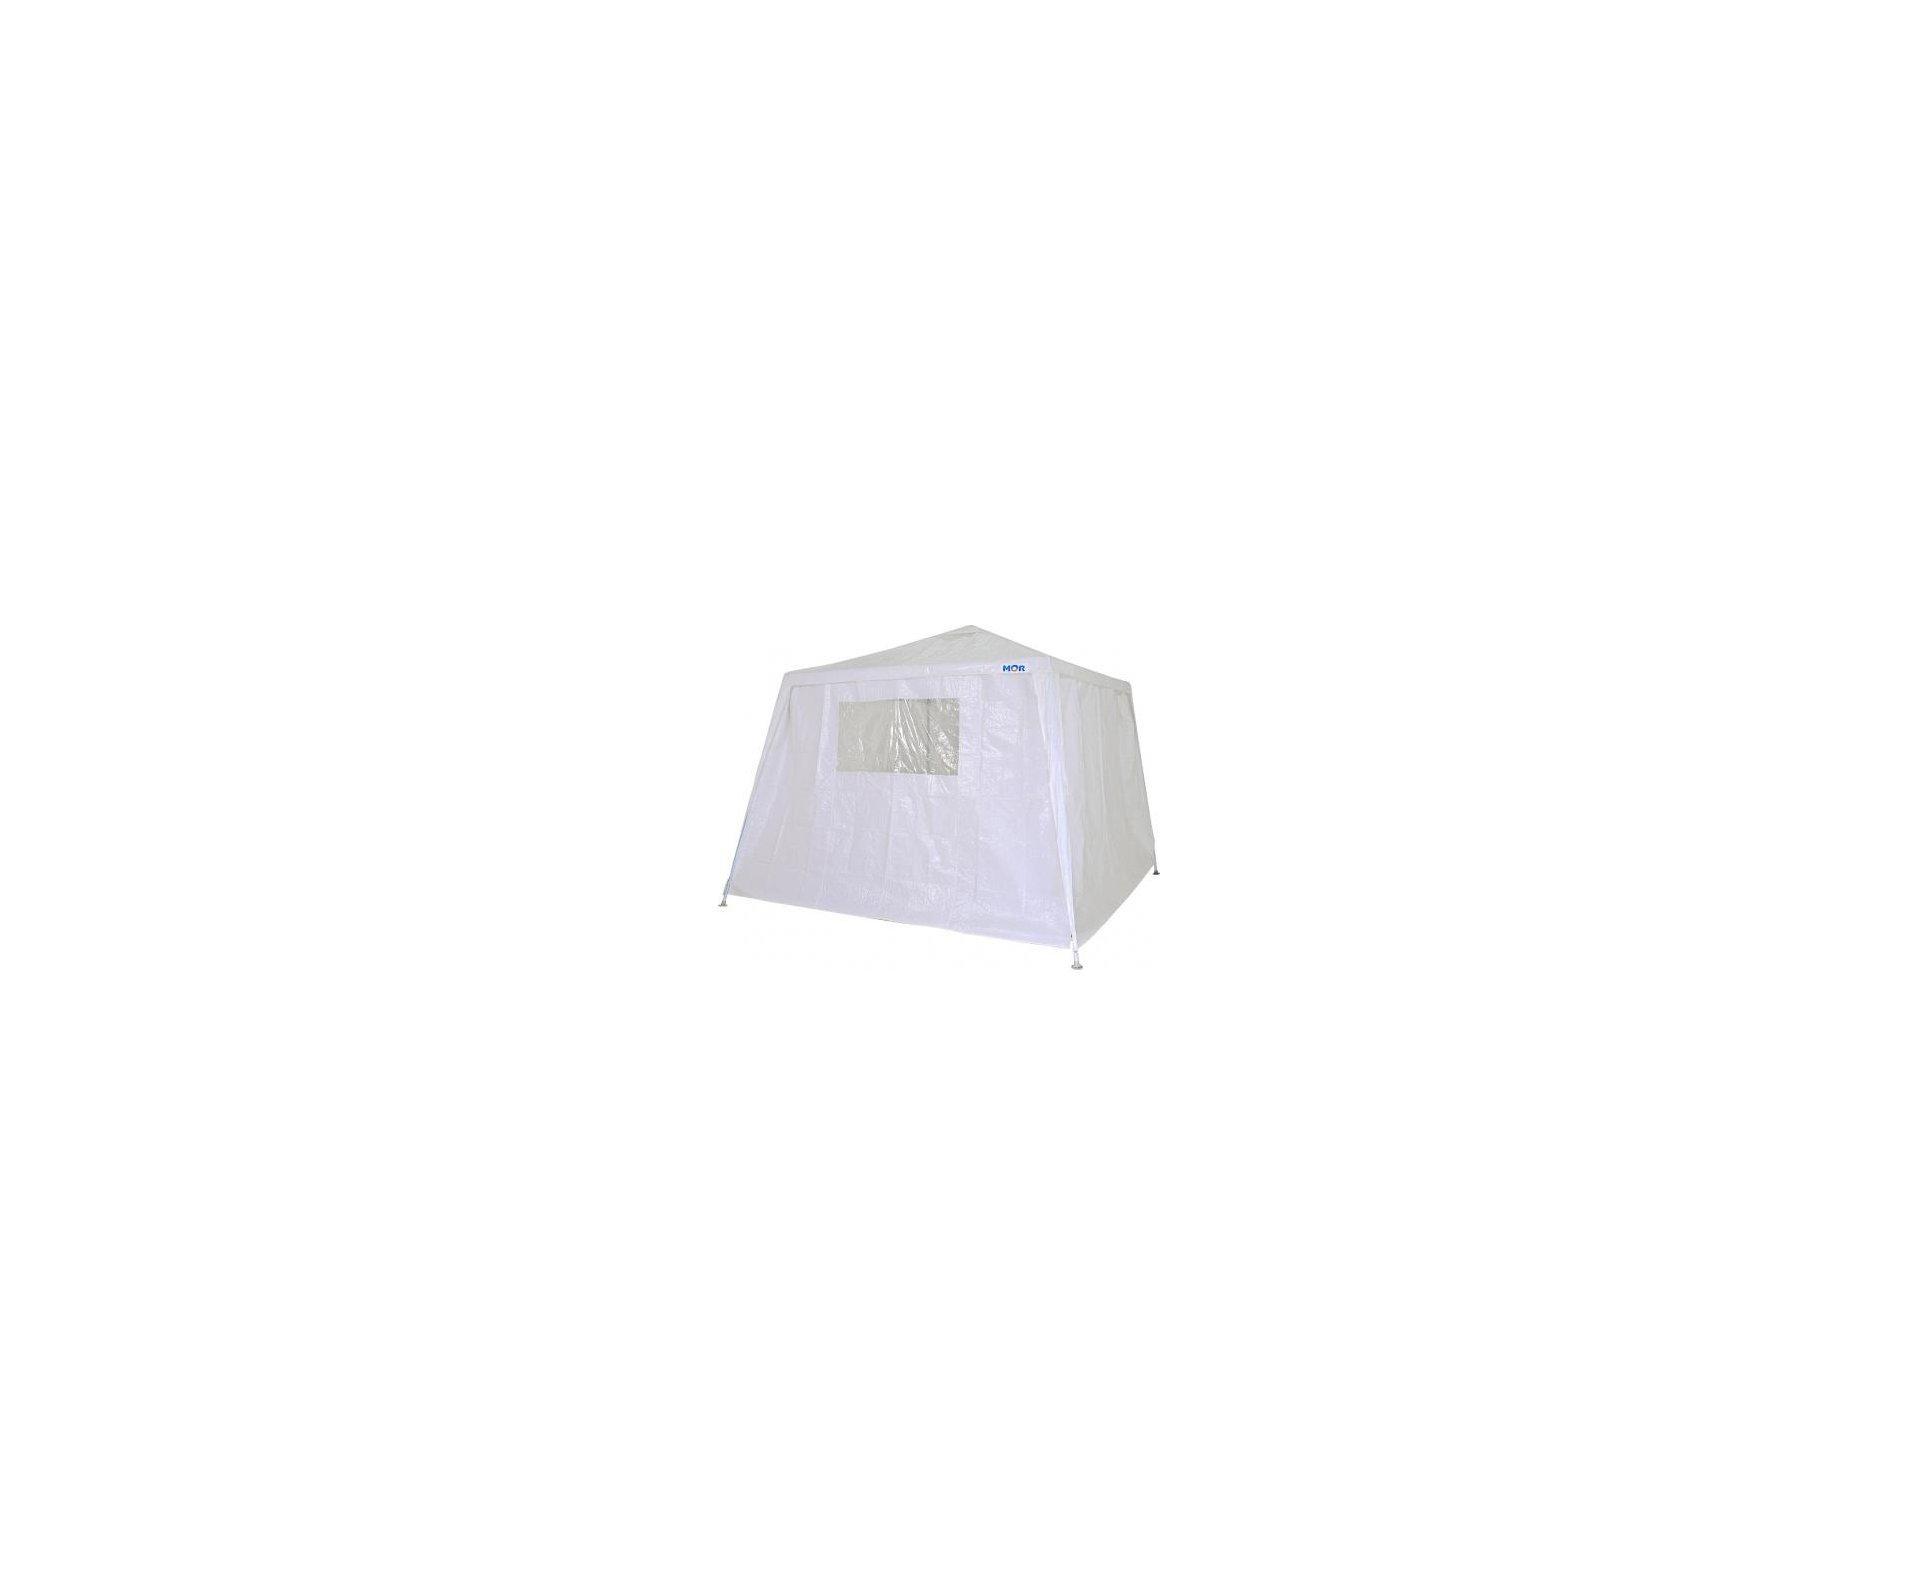 Conjunto De Parede Para Gazebo 2,4 X 3,0m - Branco - Mor